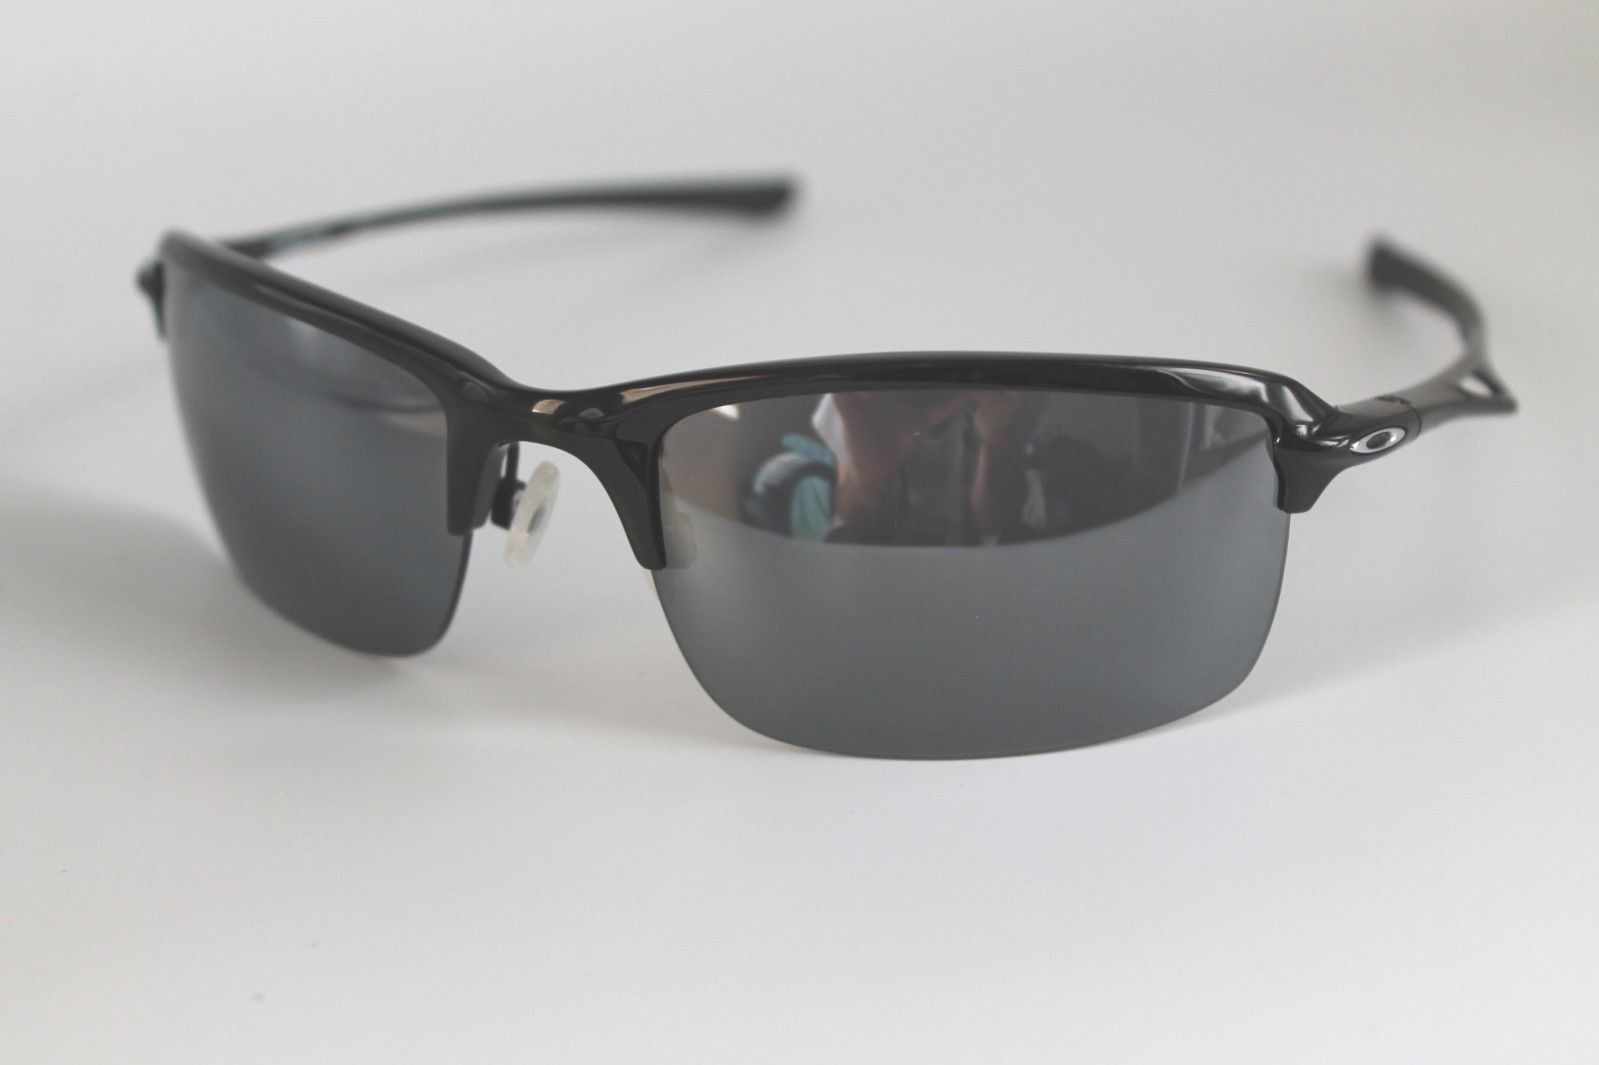 2b6d3f31288 57. 57. Previous. Oakley Wiretap Sunglasses OO4071-01 Polished Black Frame  W  Black Iridium Lens